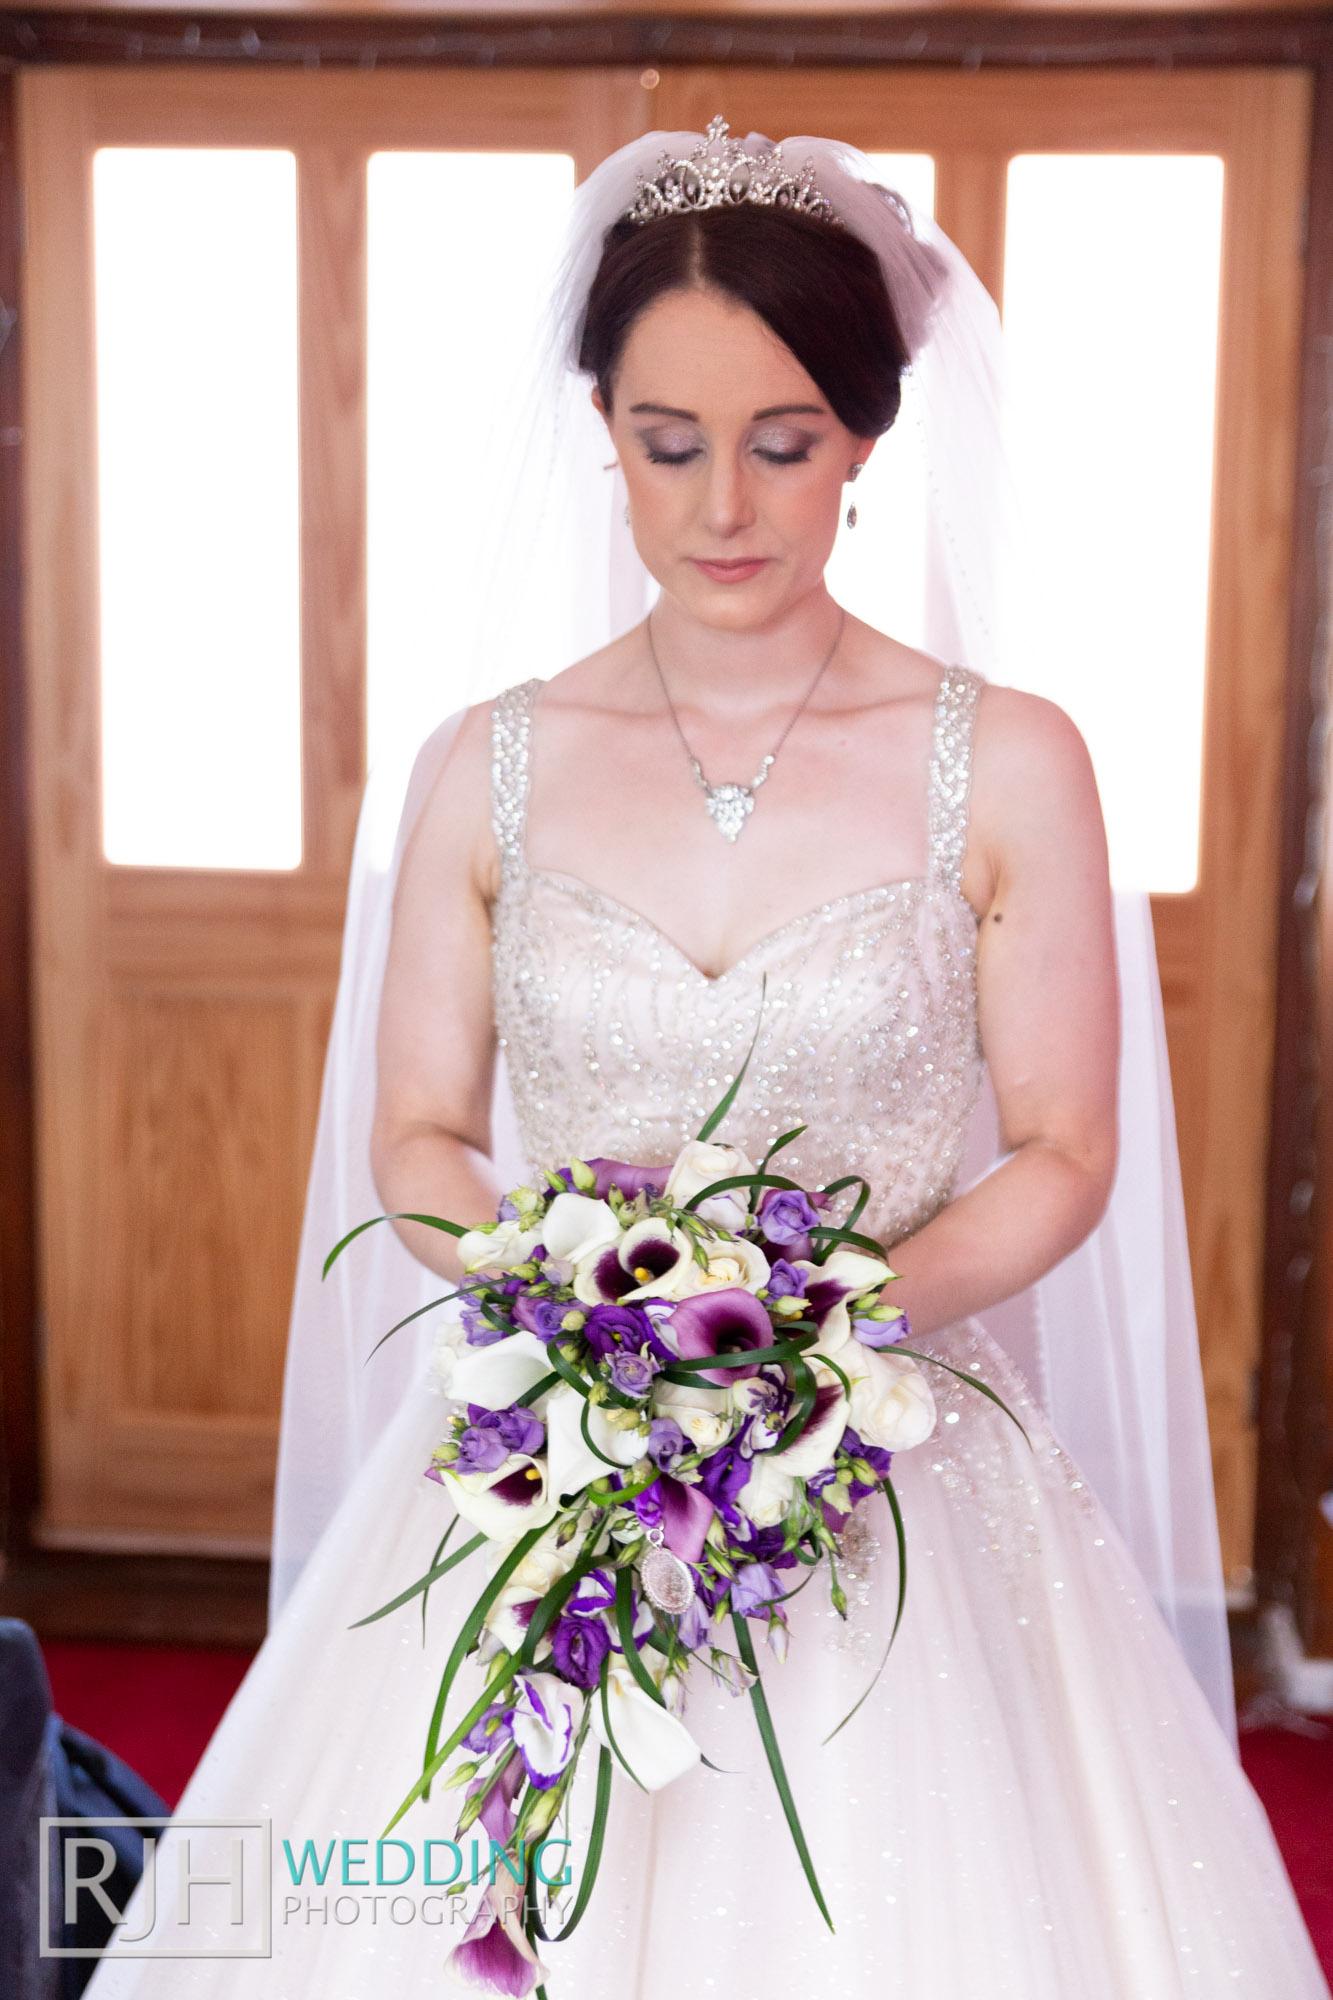 Oulton Hall Wedding Photography_Goodwill-Hall_015_IMG_6387.jpg